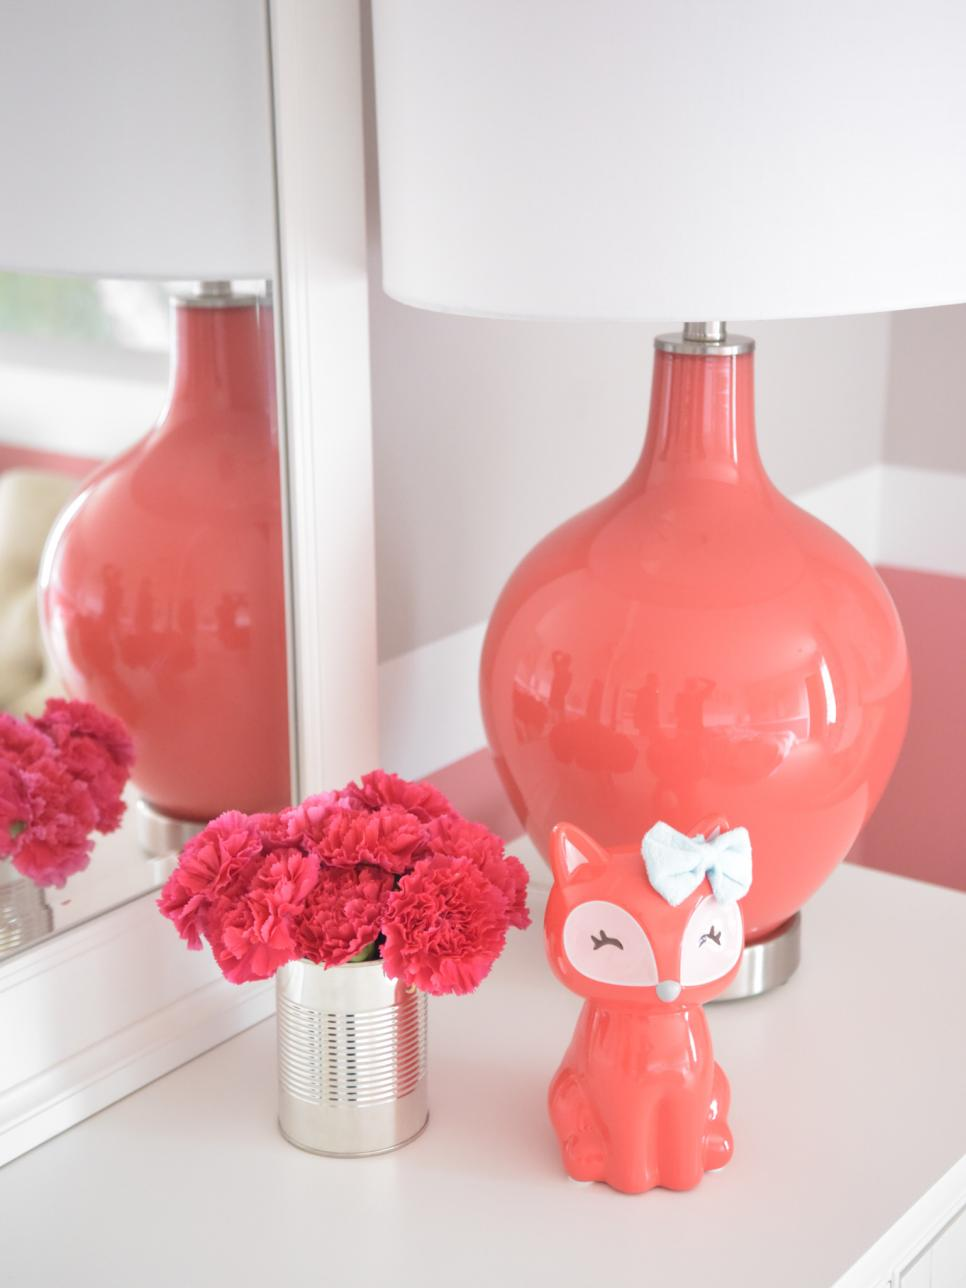 Salmon Colored Herringbone Blazer: Rooms Viewer